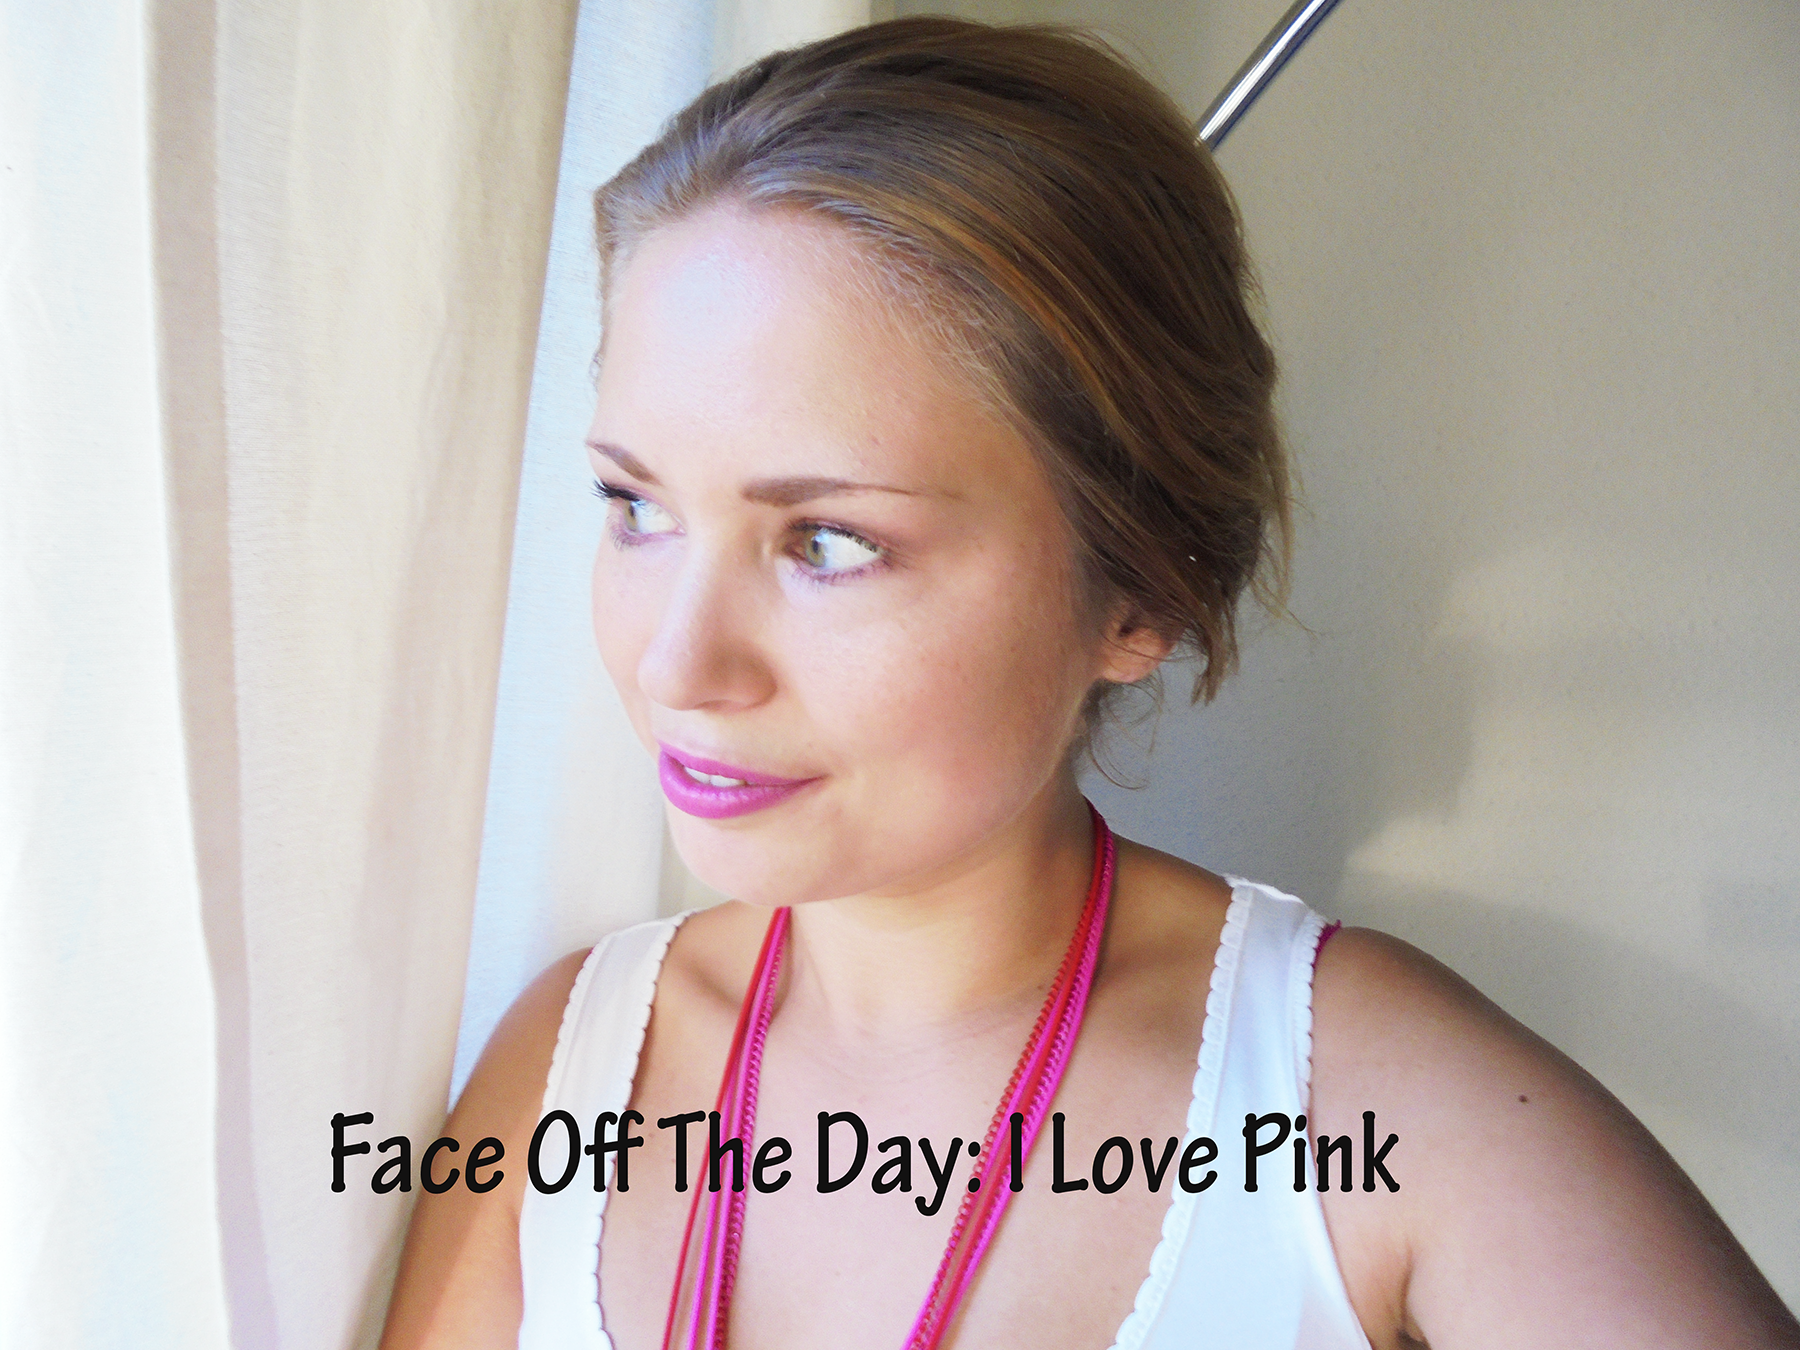 FOTD: I Love Pink